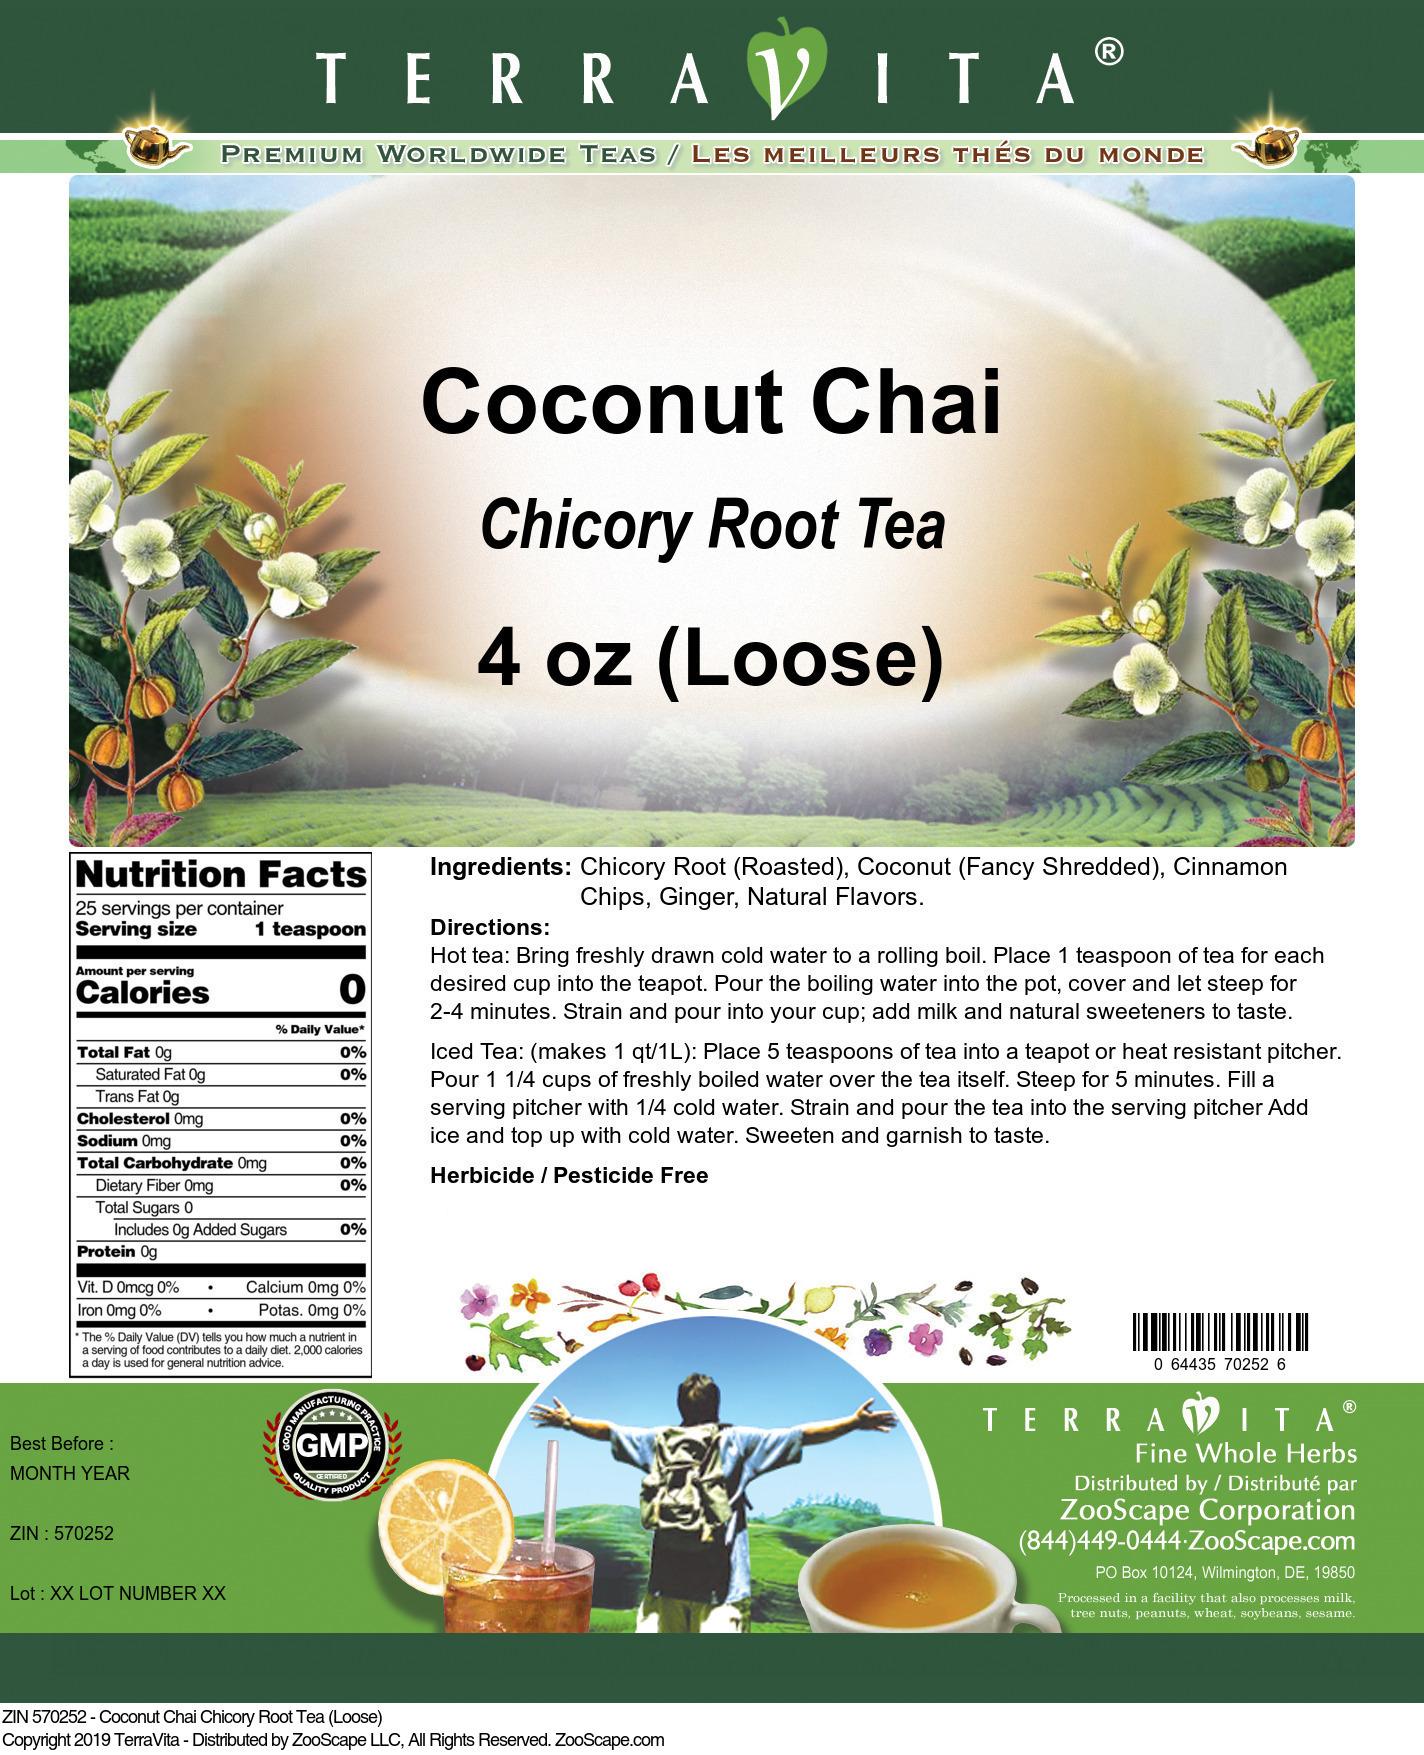 Coconut Chai Chicory Root